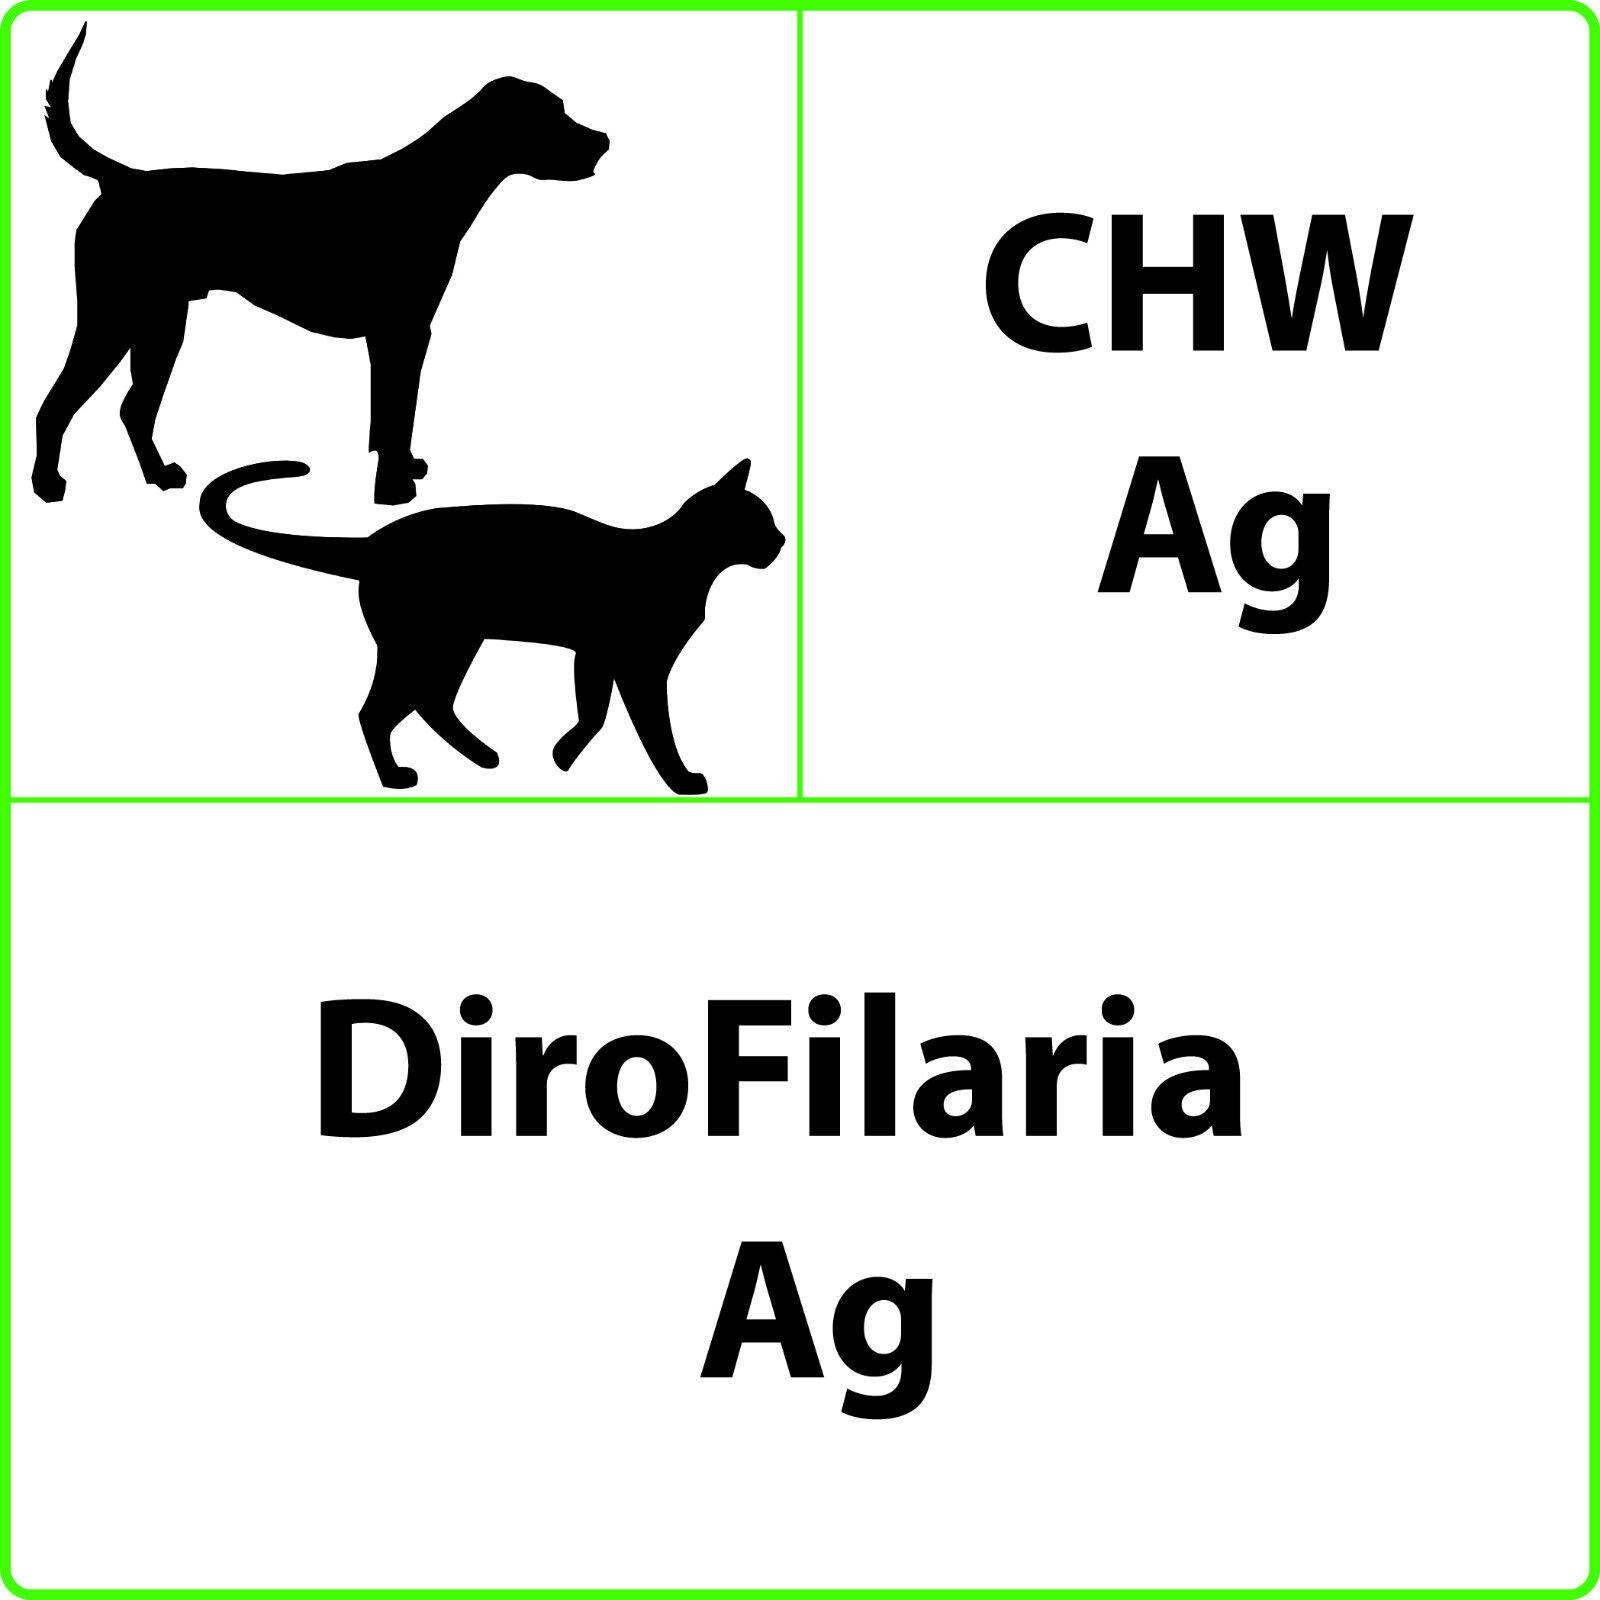 DIROFILARIA Test rapido veterinario - CHW - 5 test - Scadenza 05-2020